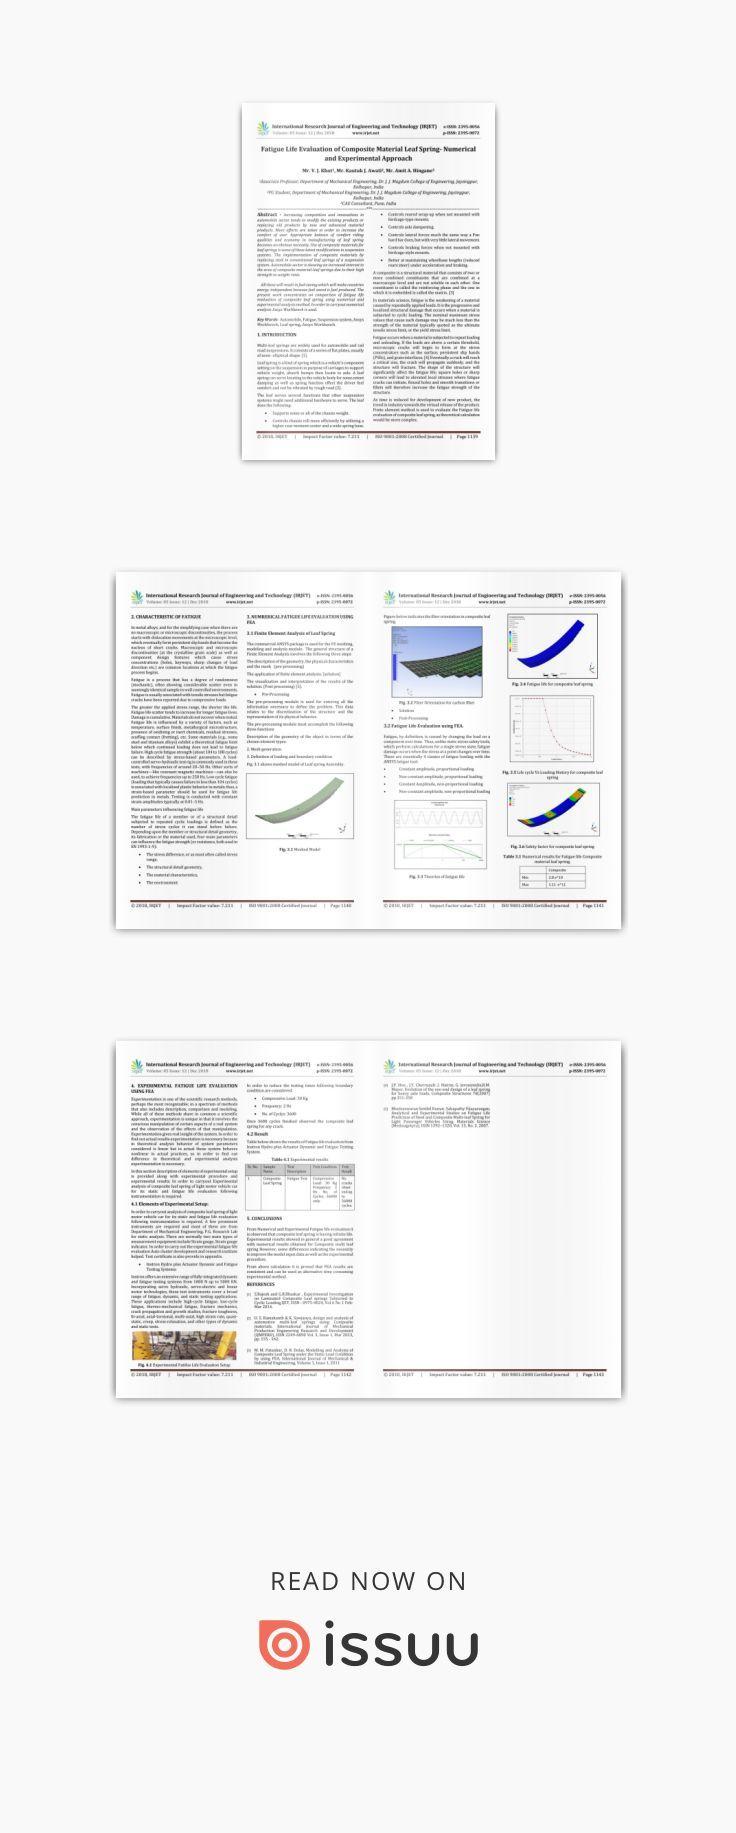 IRJET- Fatigue Life Evaluation of Composite Material Leaf